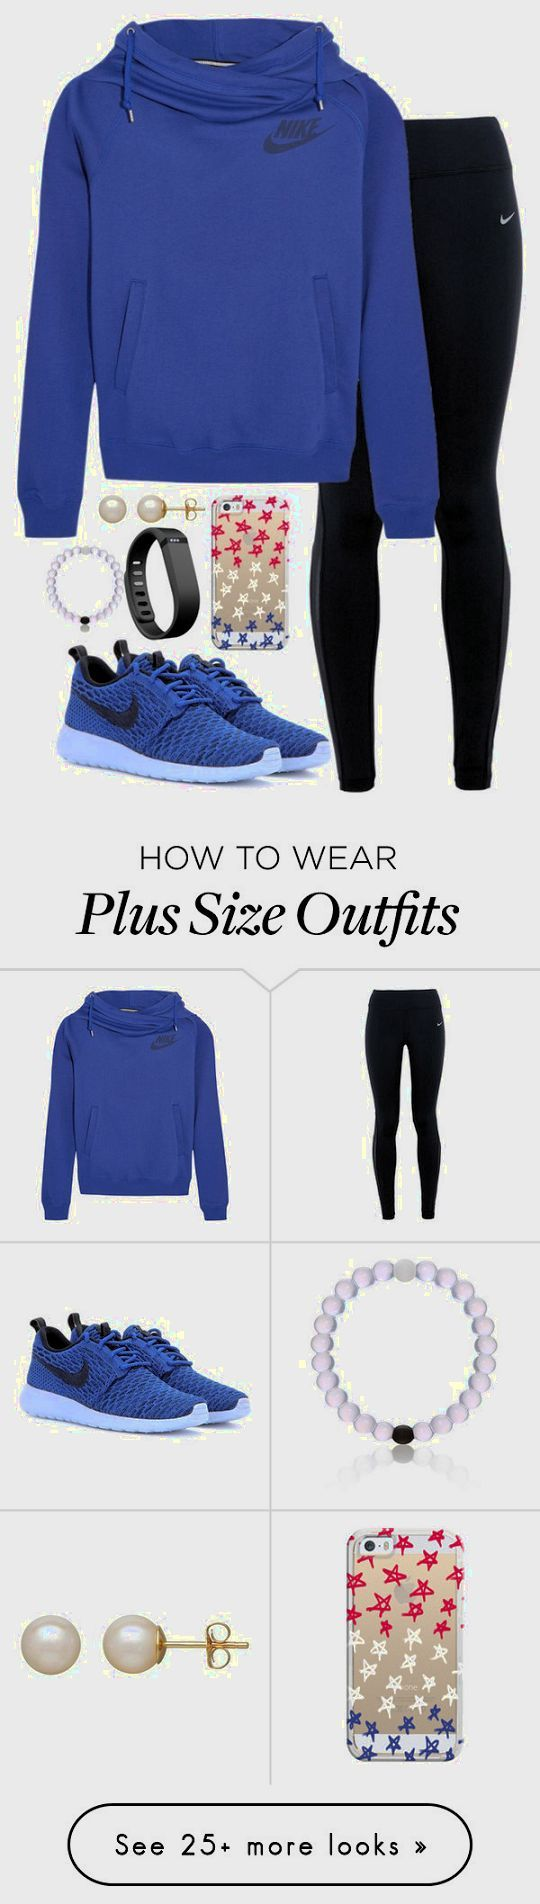 'Workout' Clothes